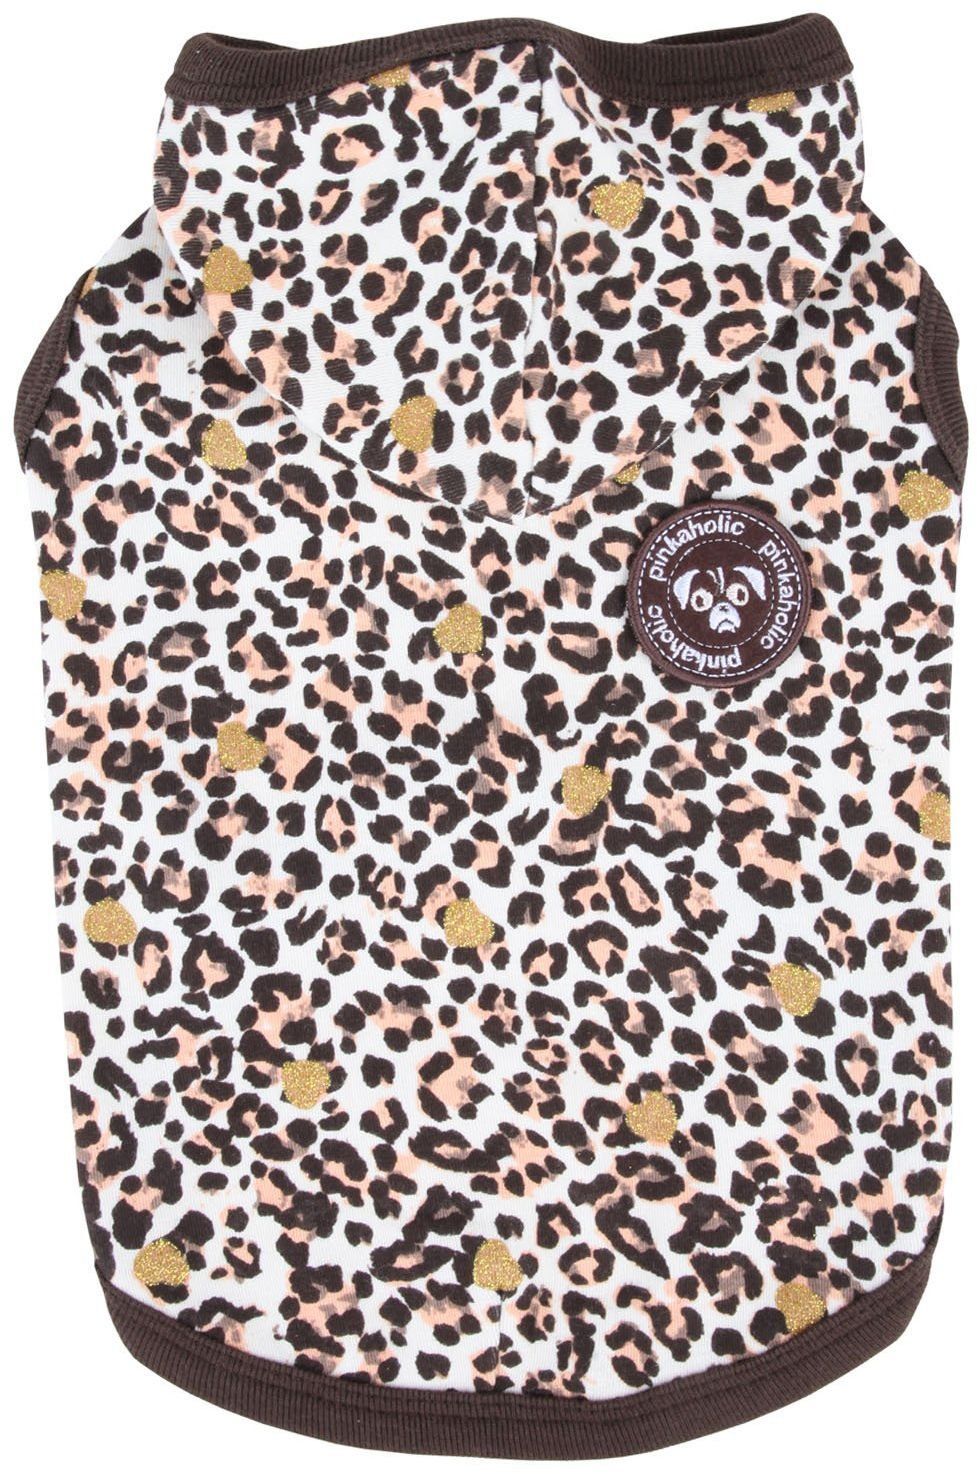 Pinkaholic New York NAPA-TS7112 koszulka dla psa, Leo Pug, S, brązowa